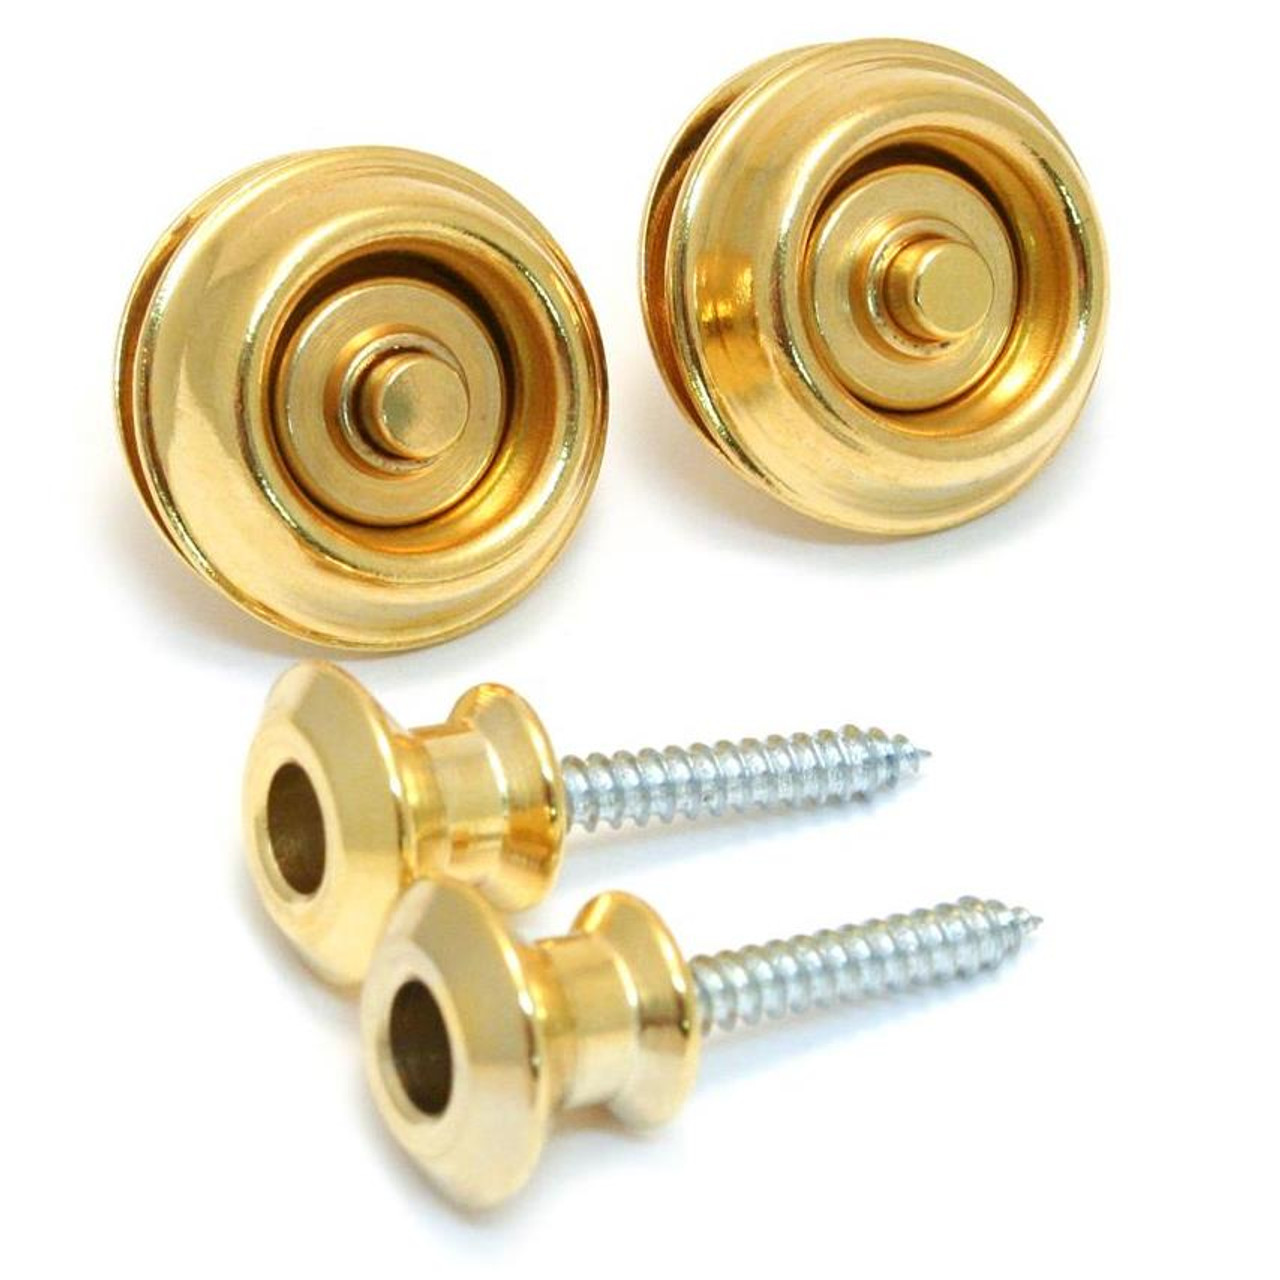 Dunlop Dual Design Strap Lock System-Gold